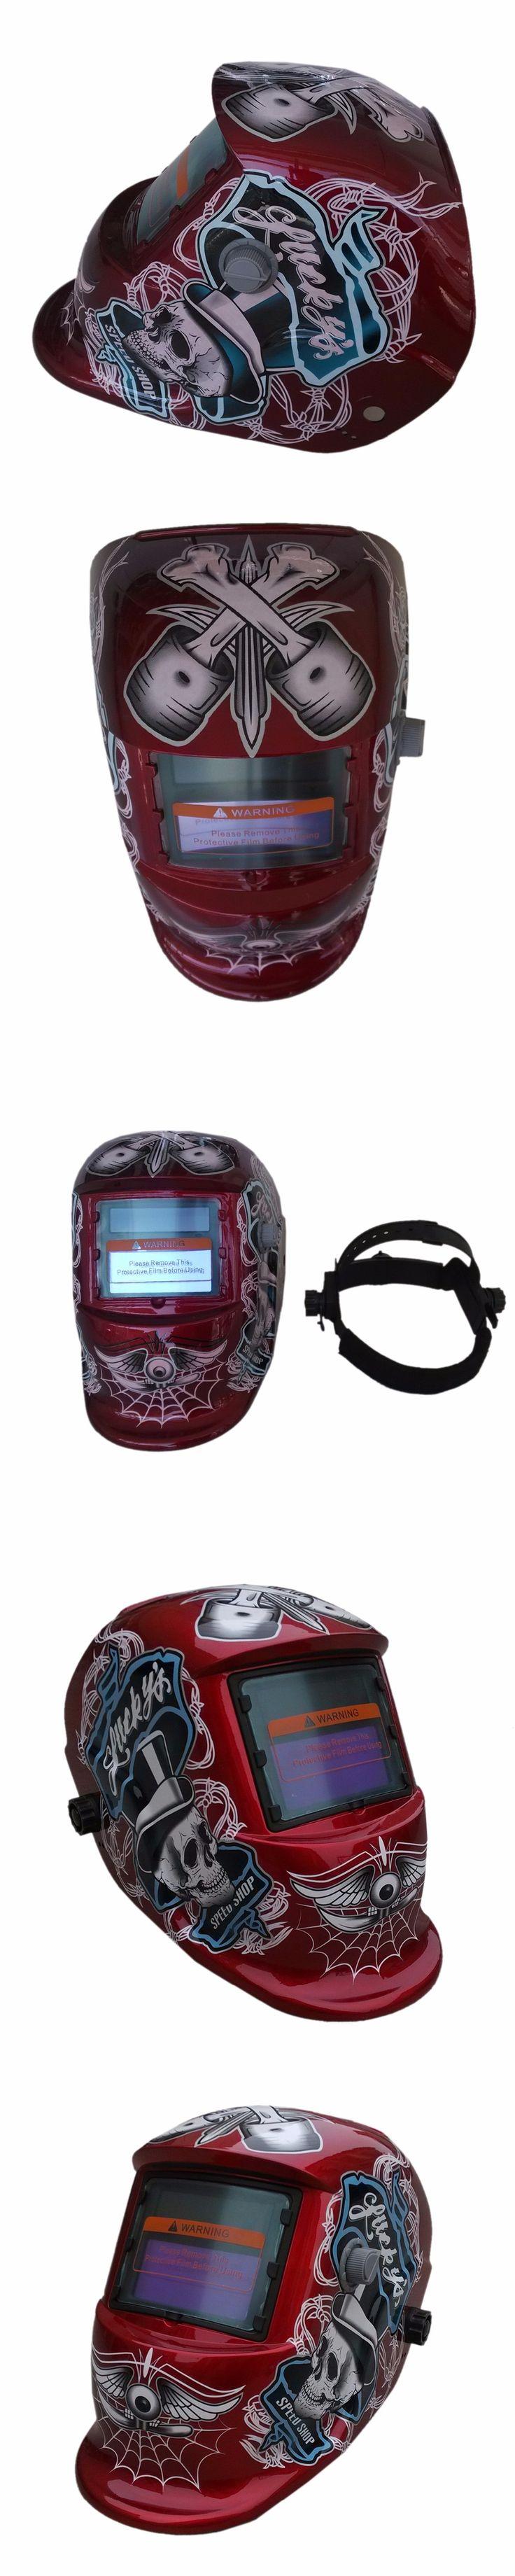 Newest KLT-HDRD Red Skull Solar Auto darkening TIG MIG MMA Electric Welding Mask Helmet Welder Cap Lens For Welding Machine